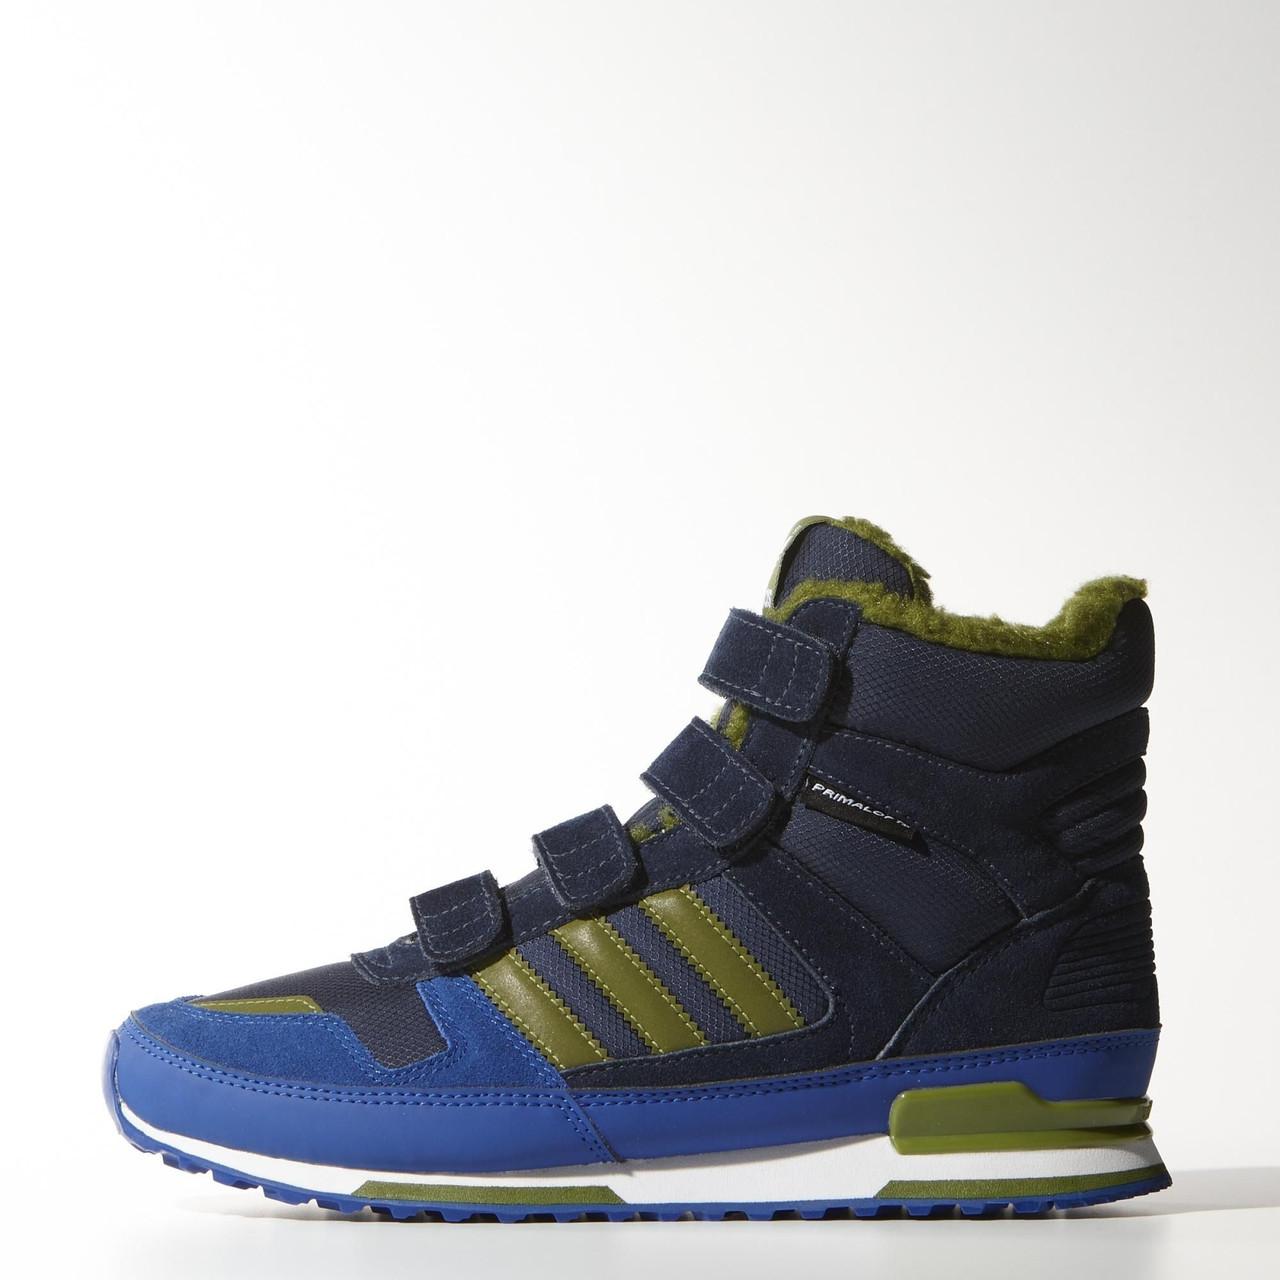 Детские ботинки Zx adidas  WINTER CF K (АРТИКУЛ: M17948)